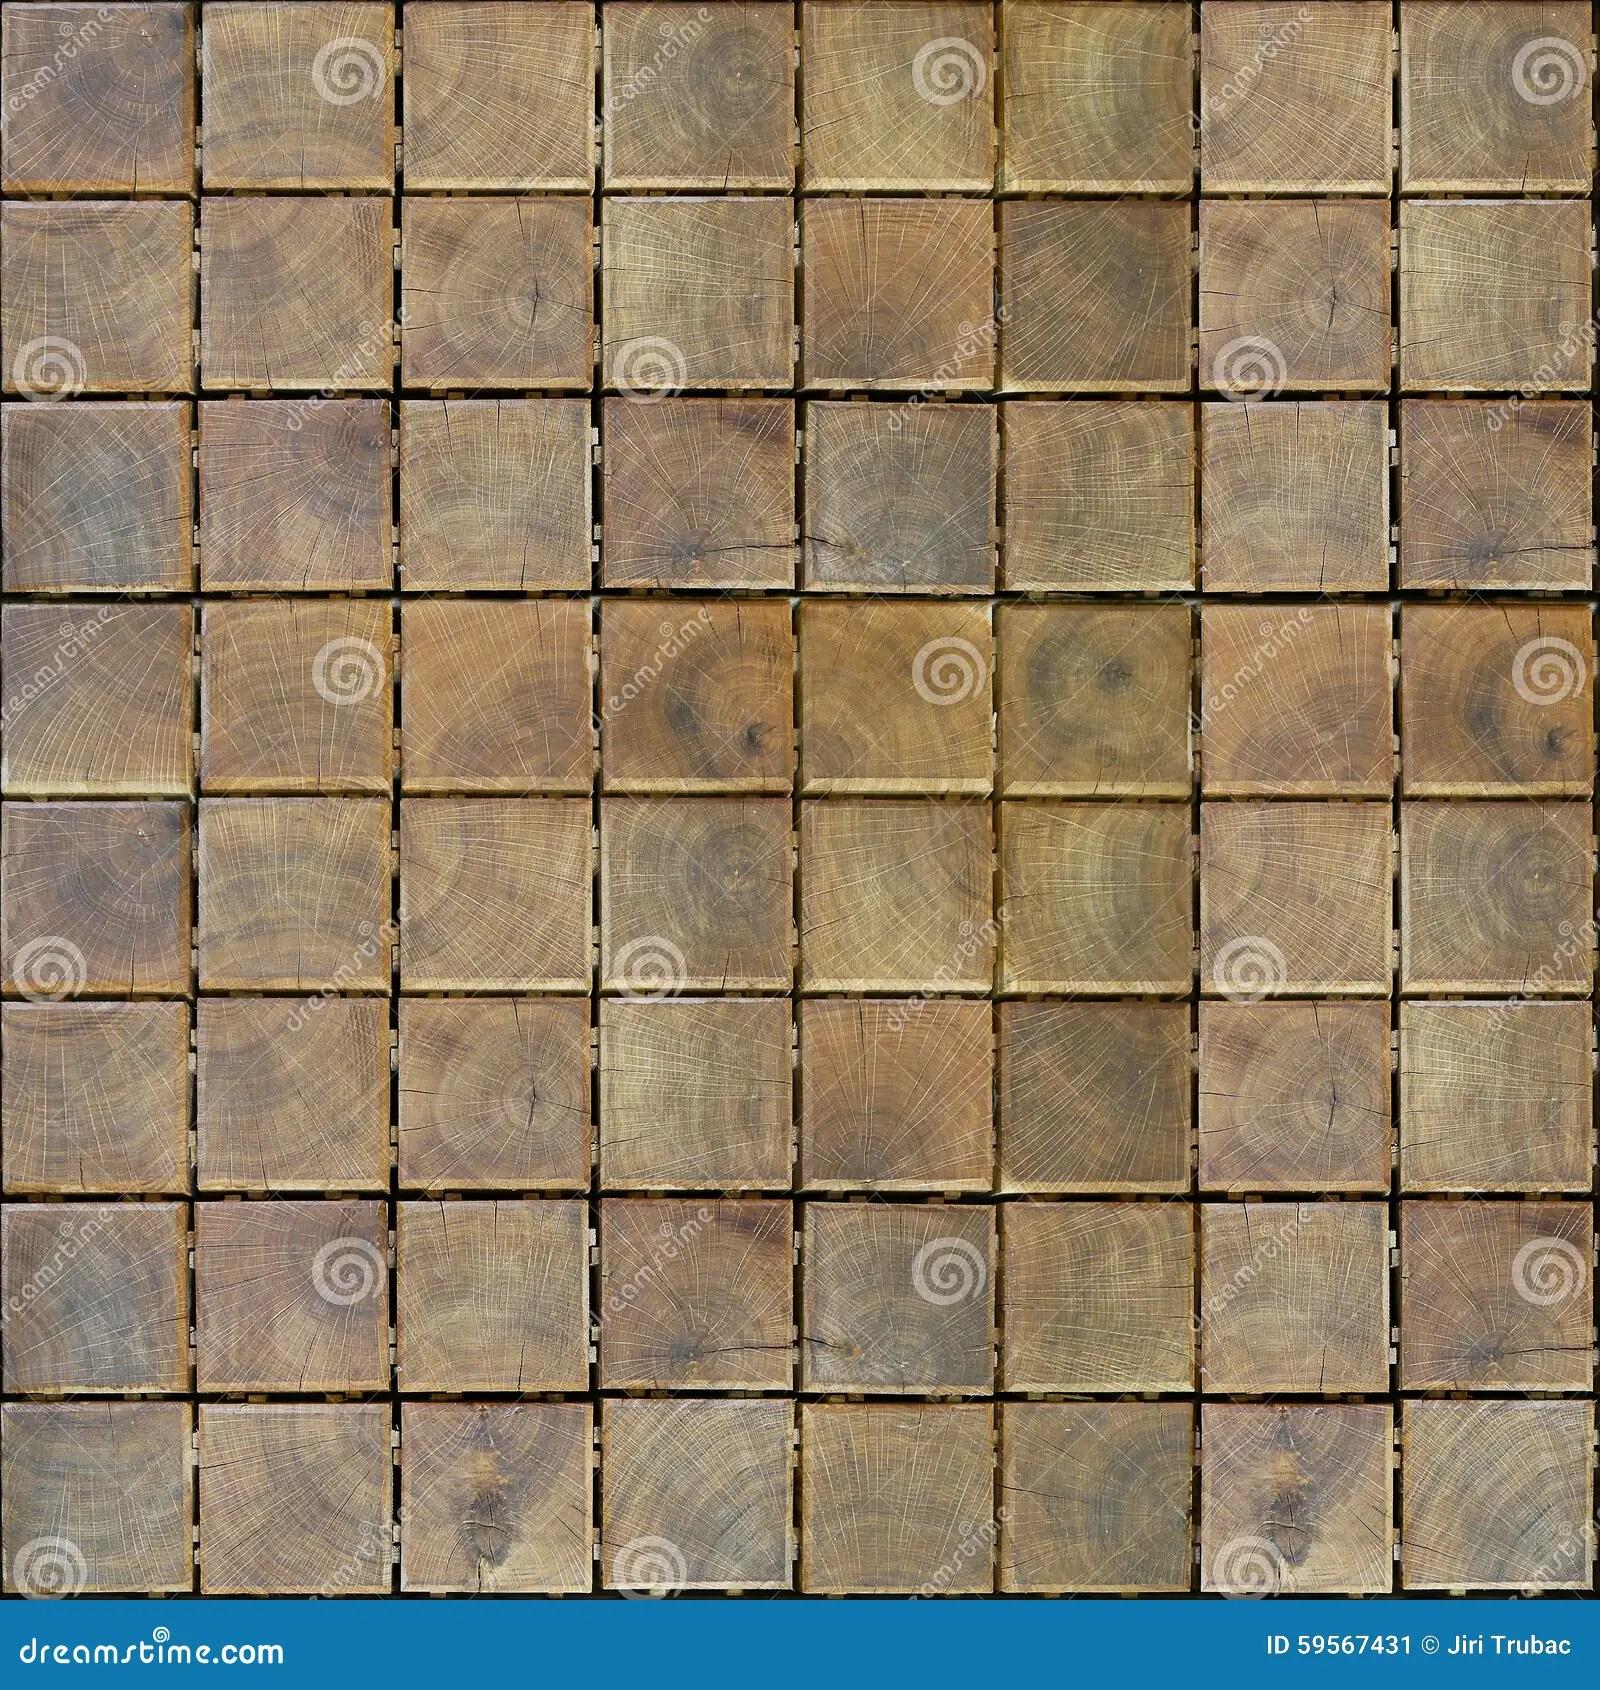 Decorative Wood Blocks